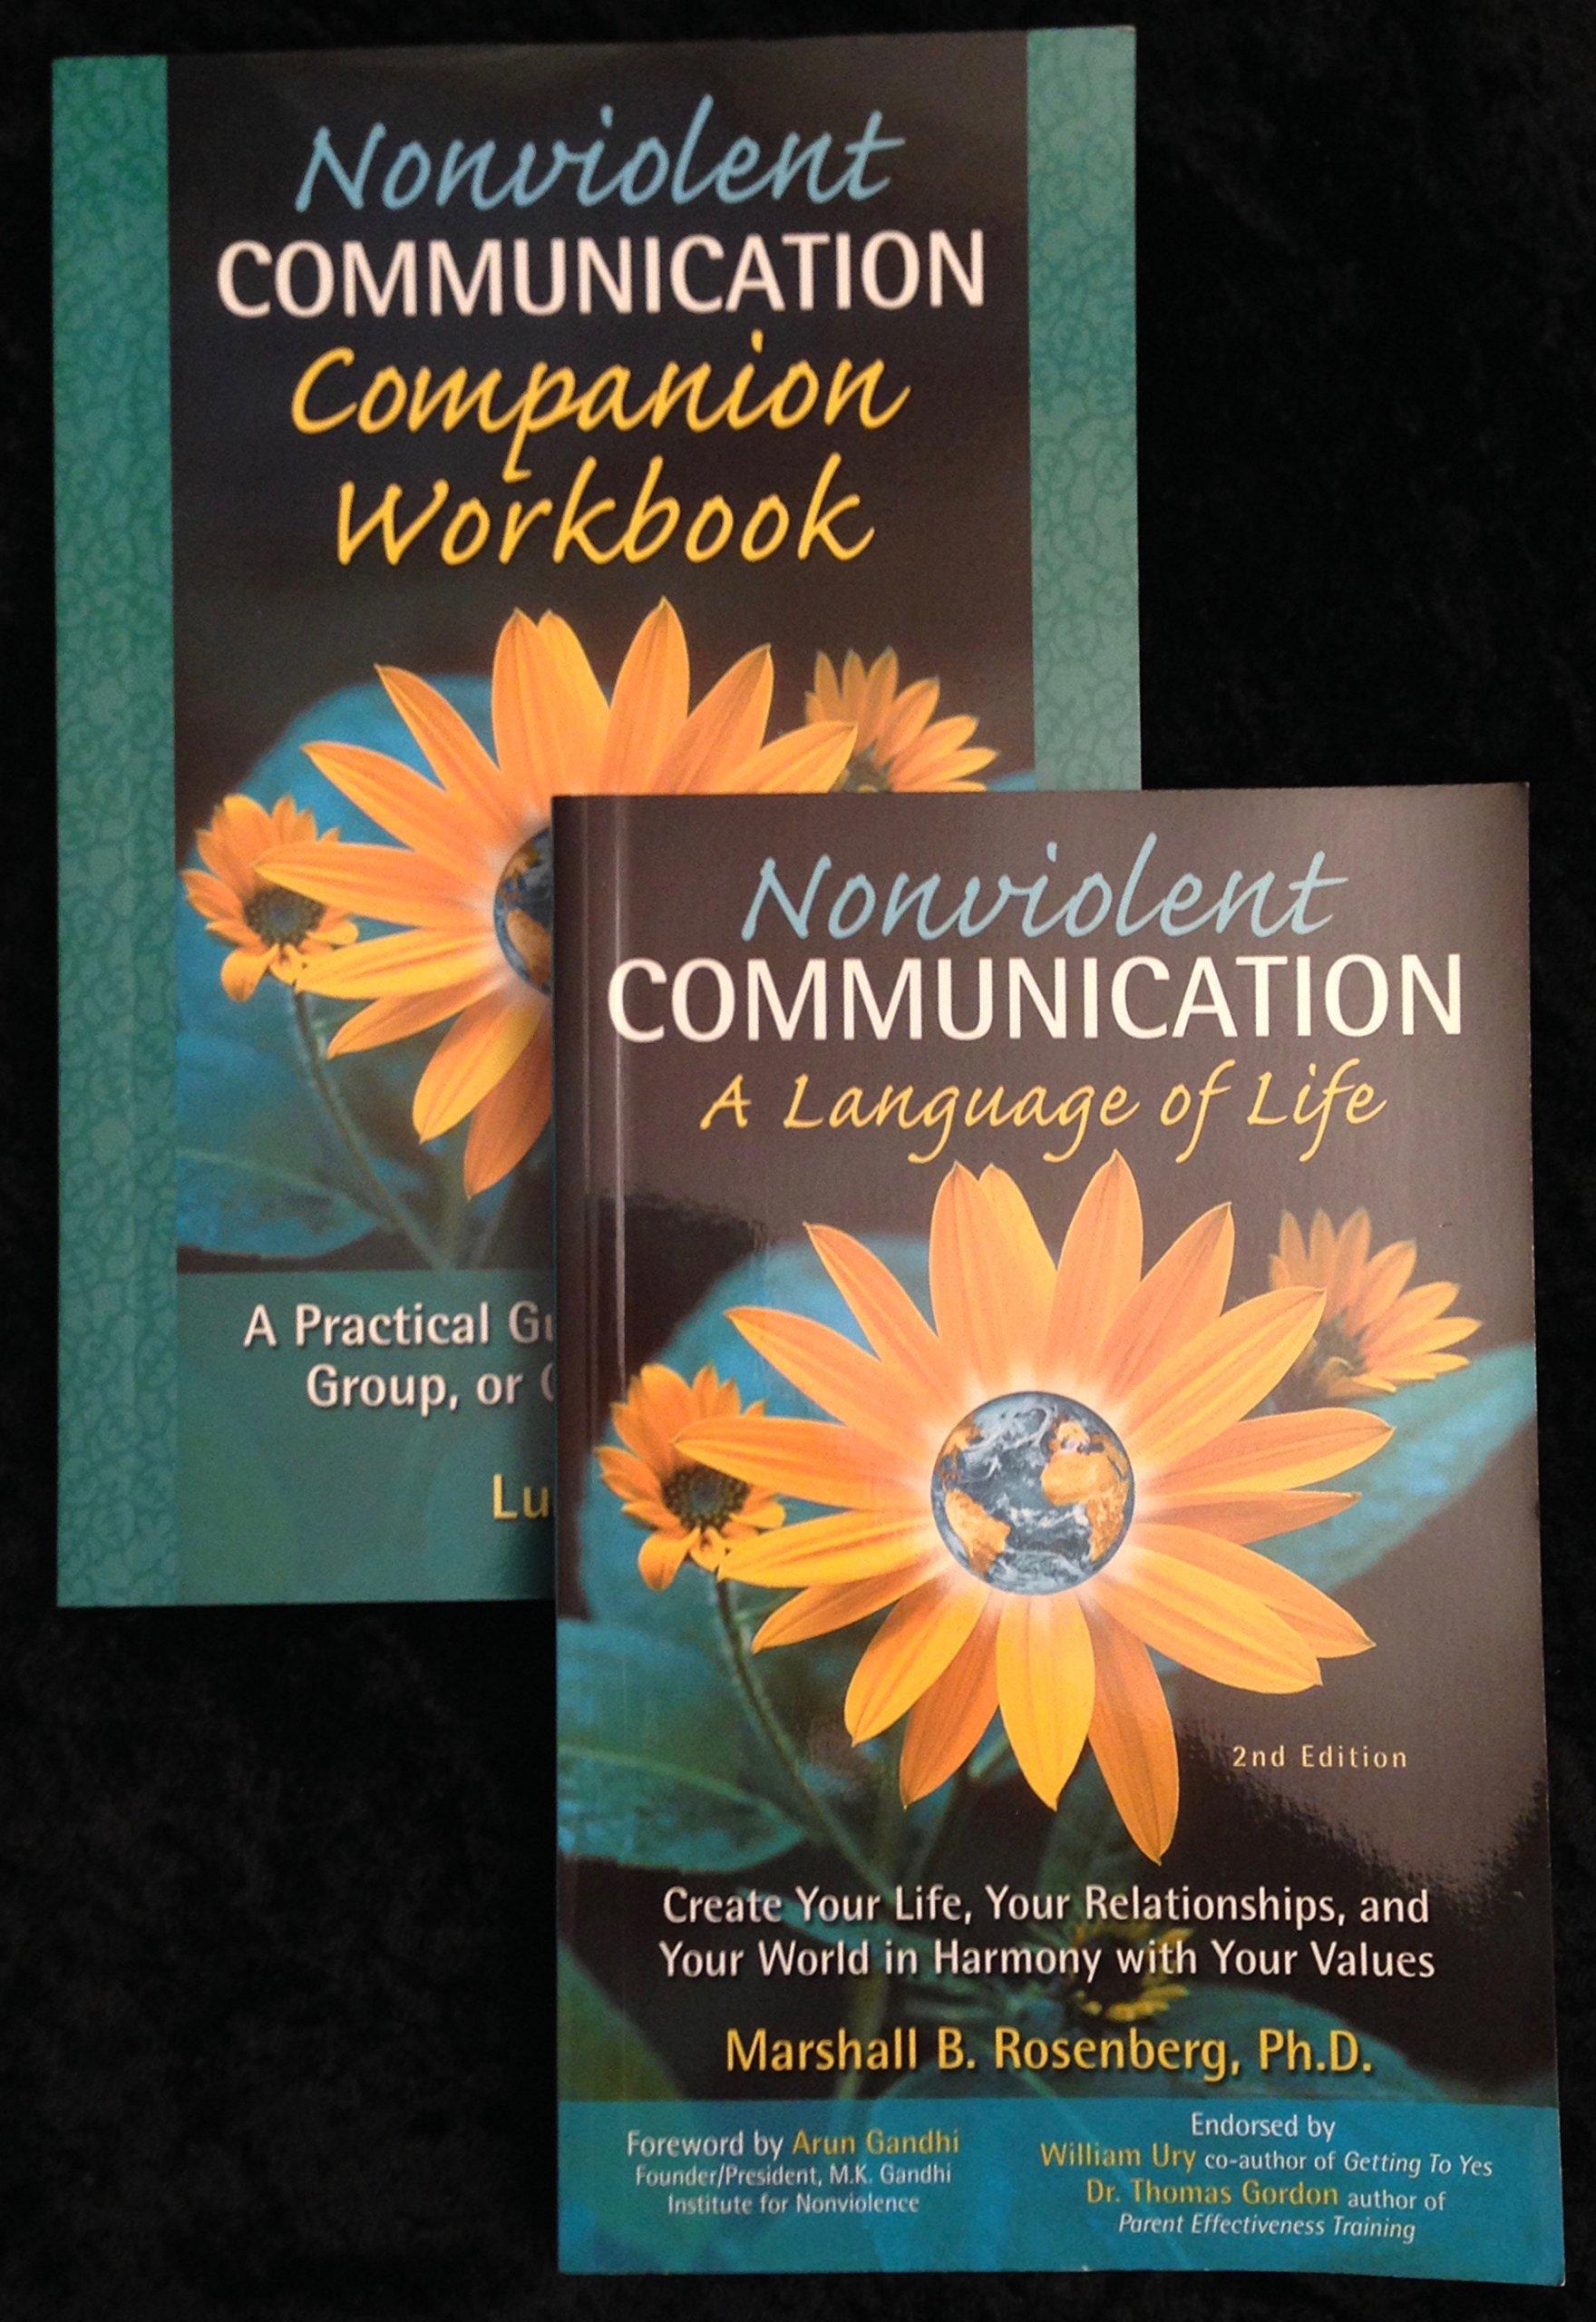 Nonviolentmunication: A Language Of Life